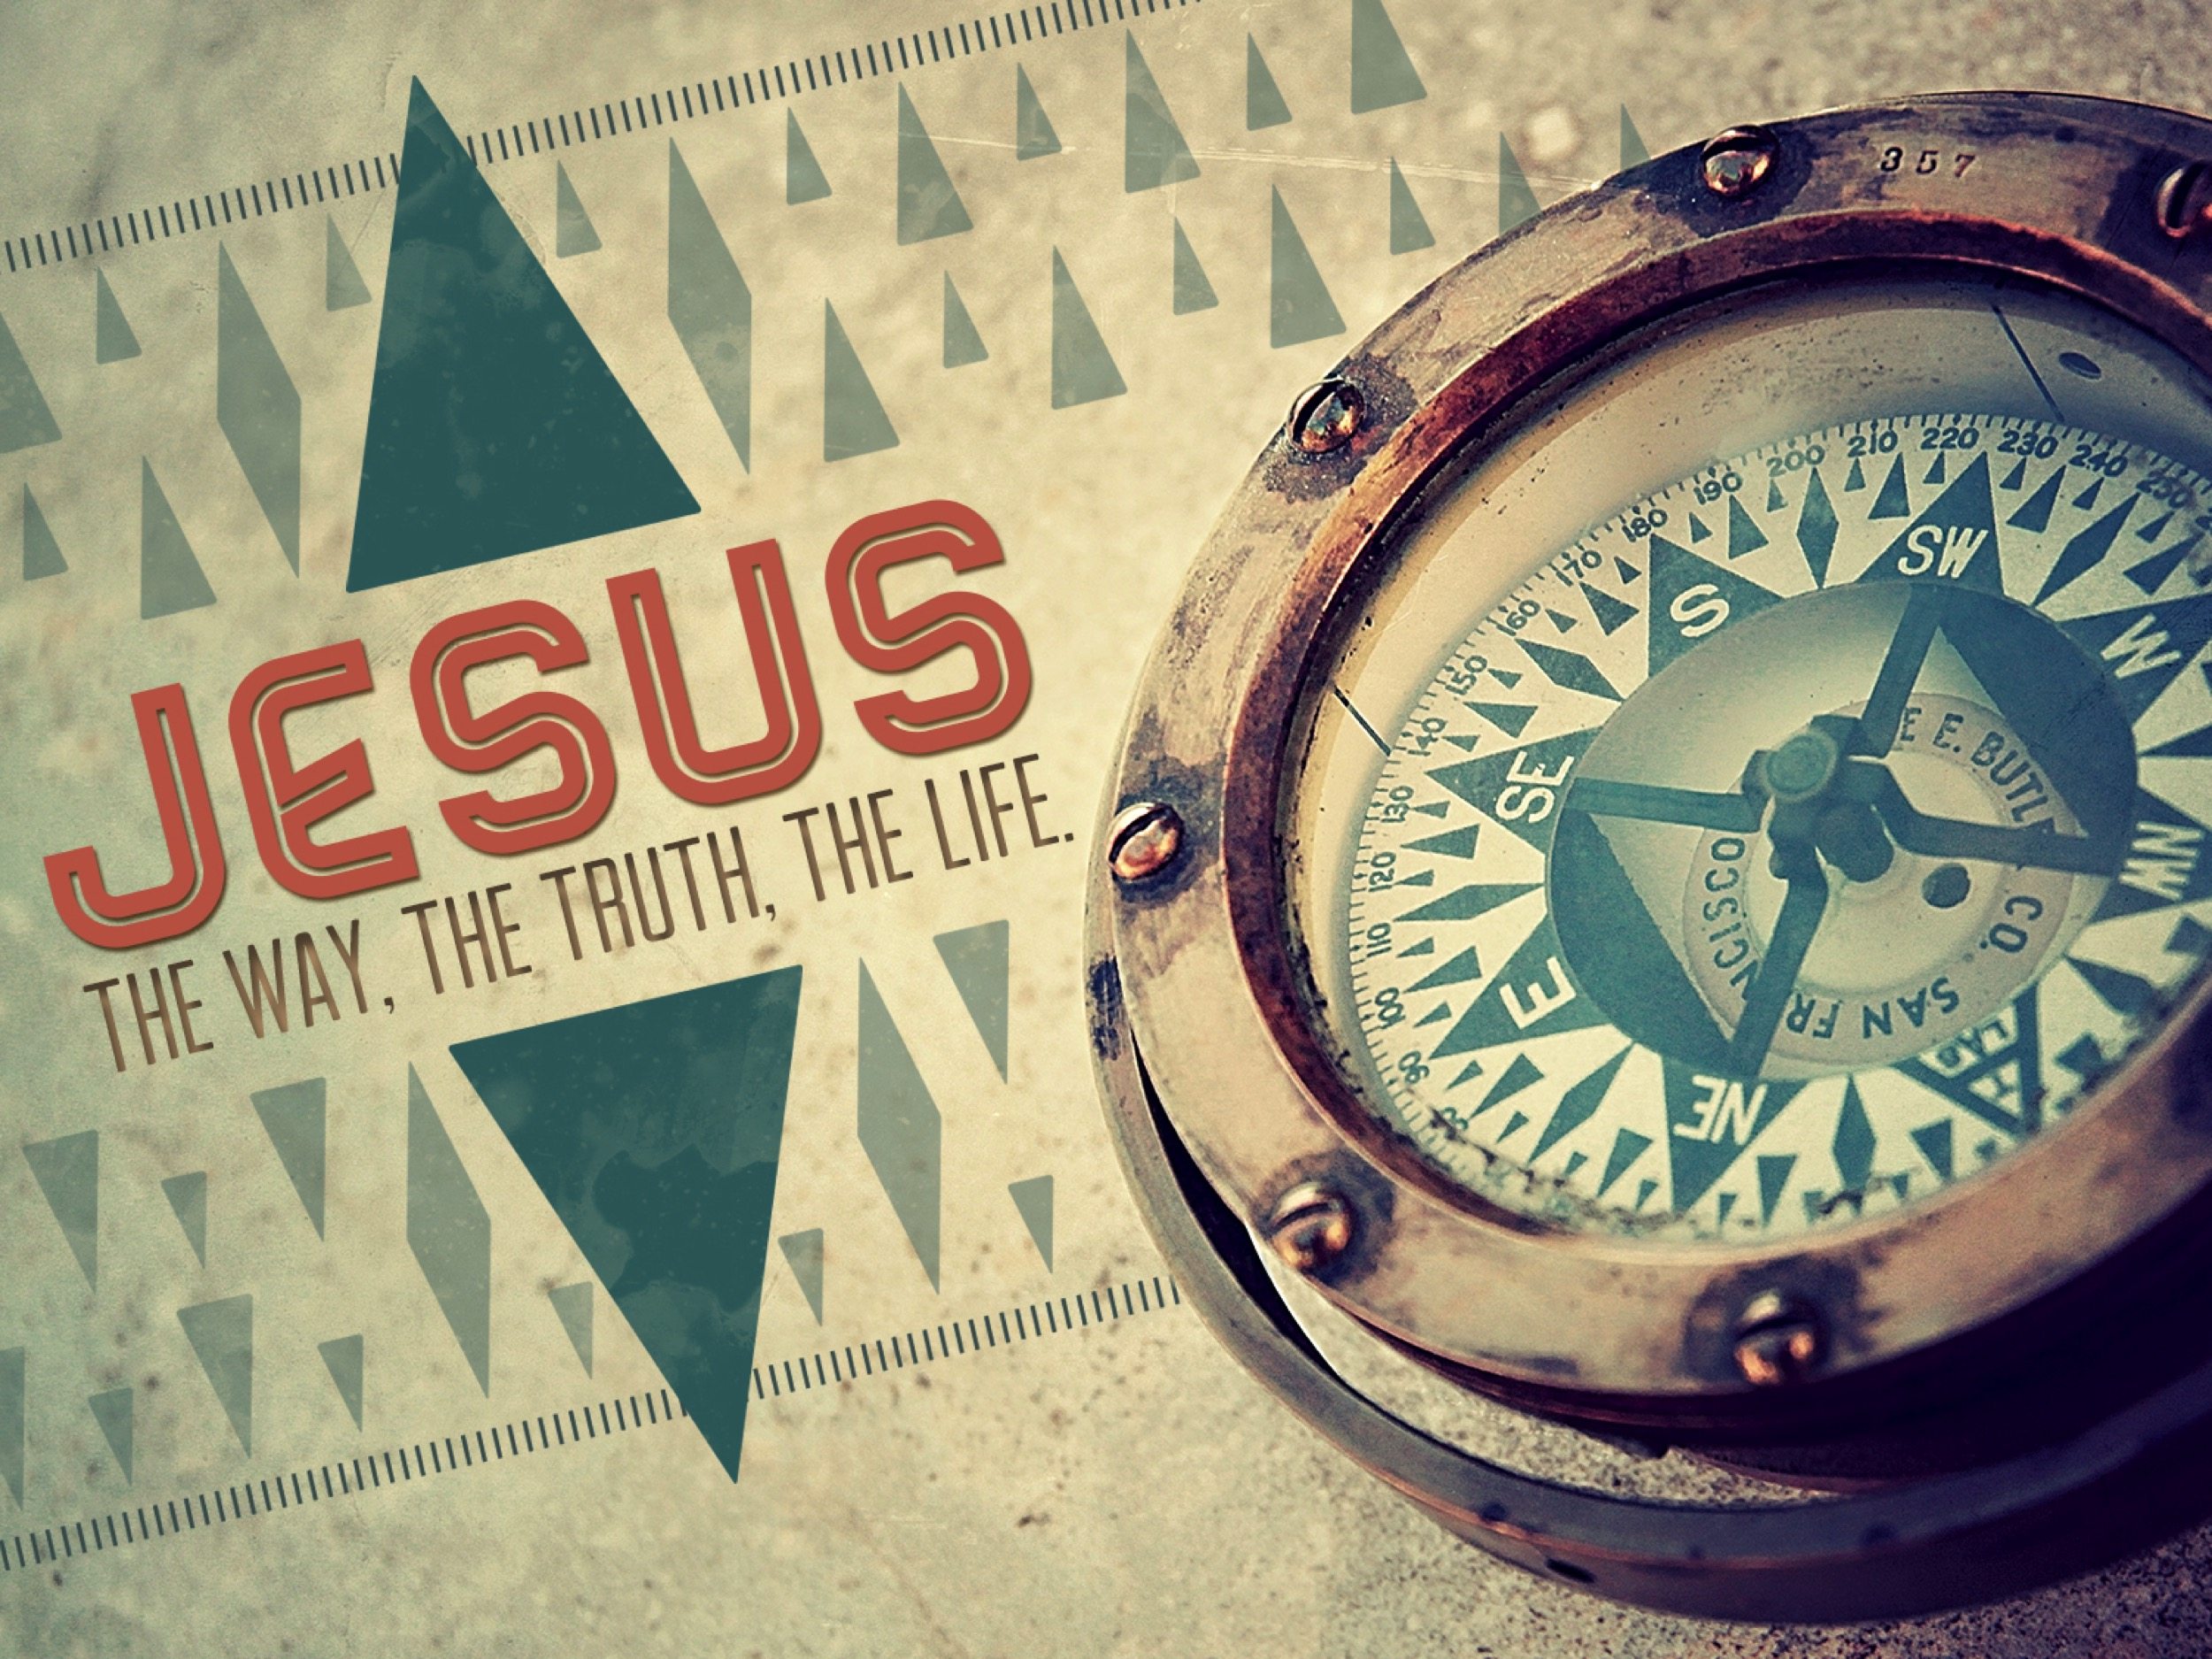 The Life Of Jesus P40